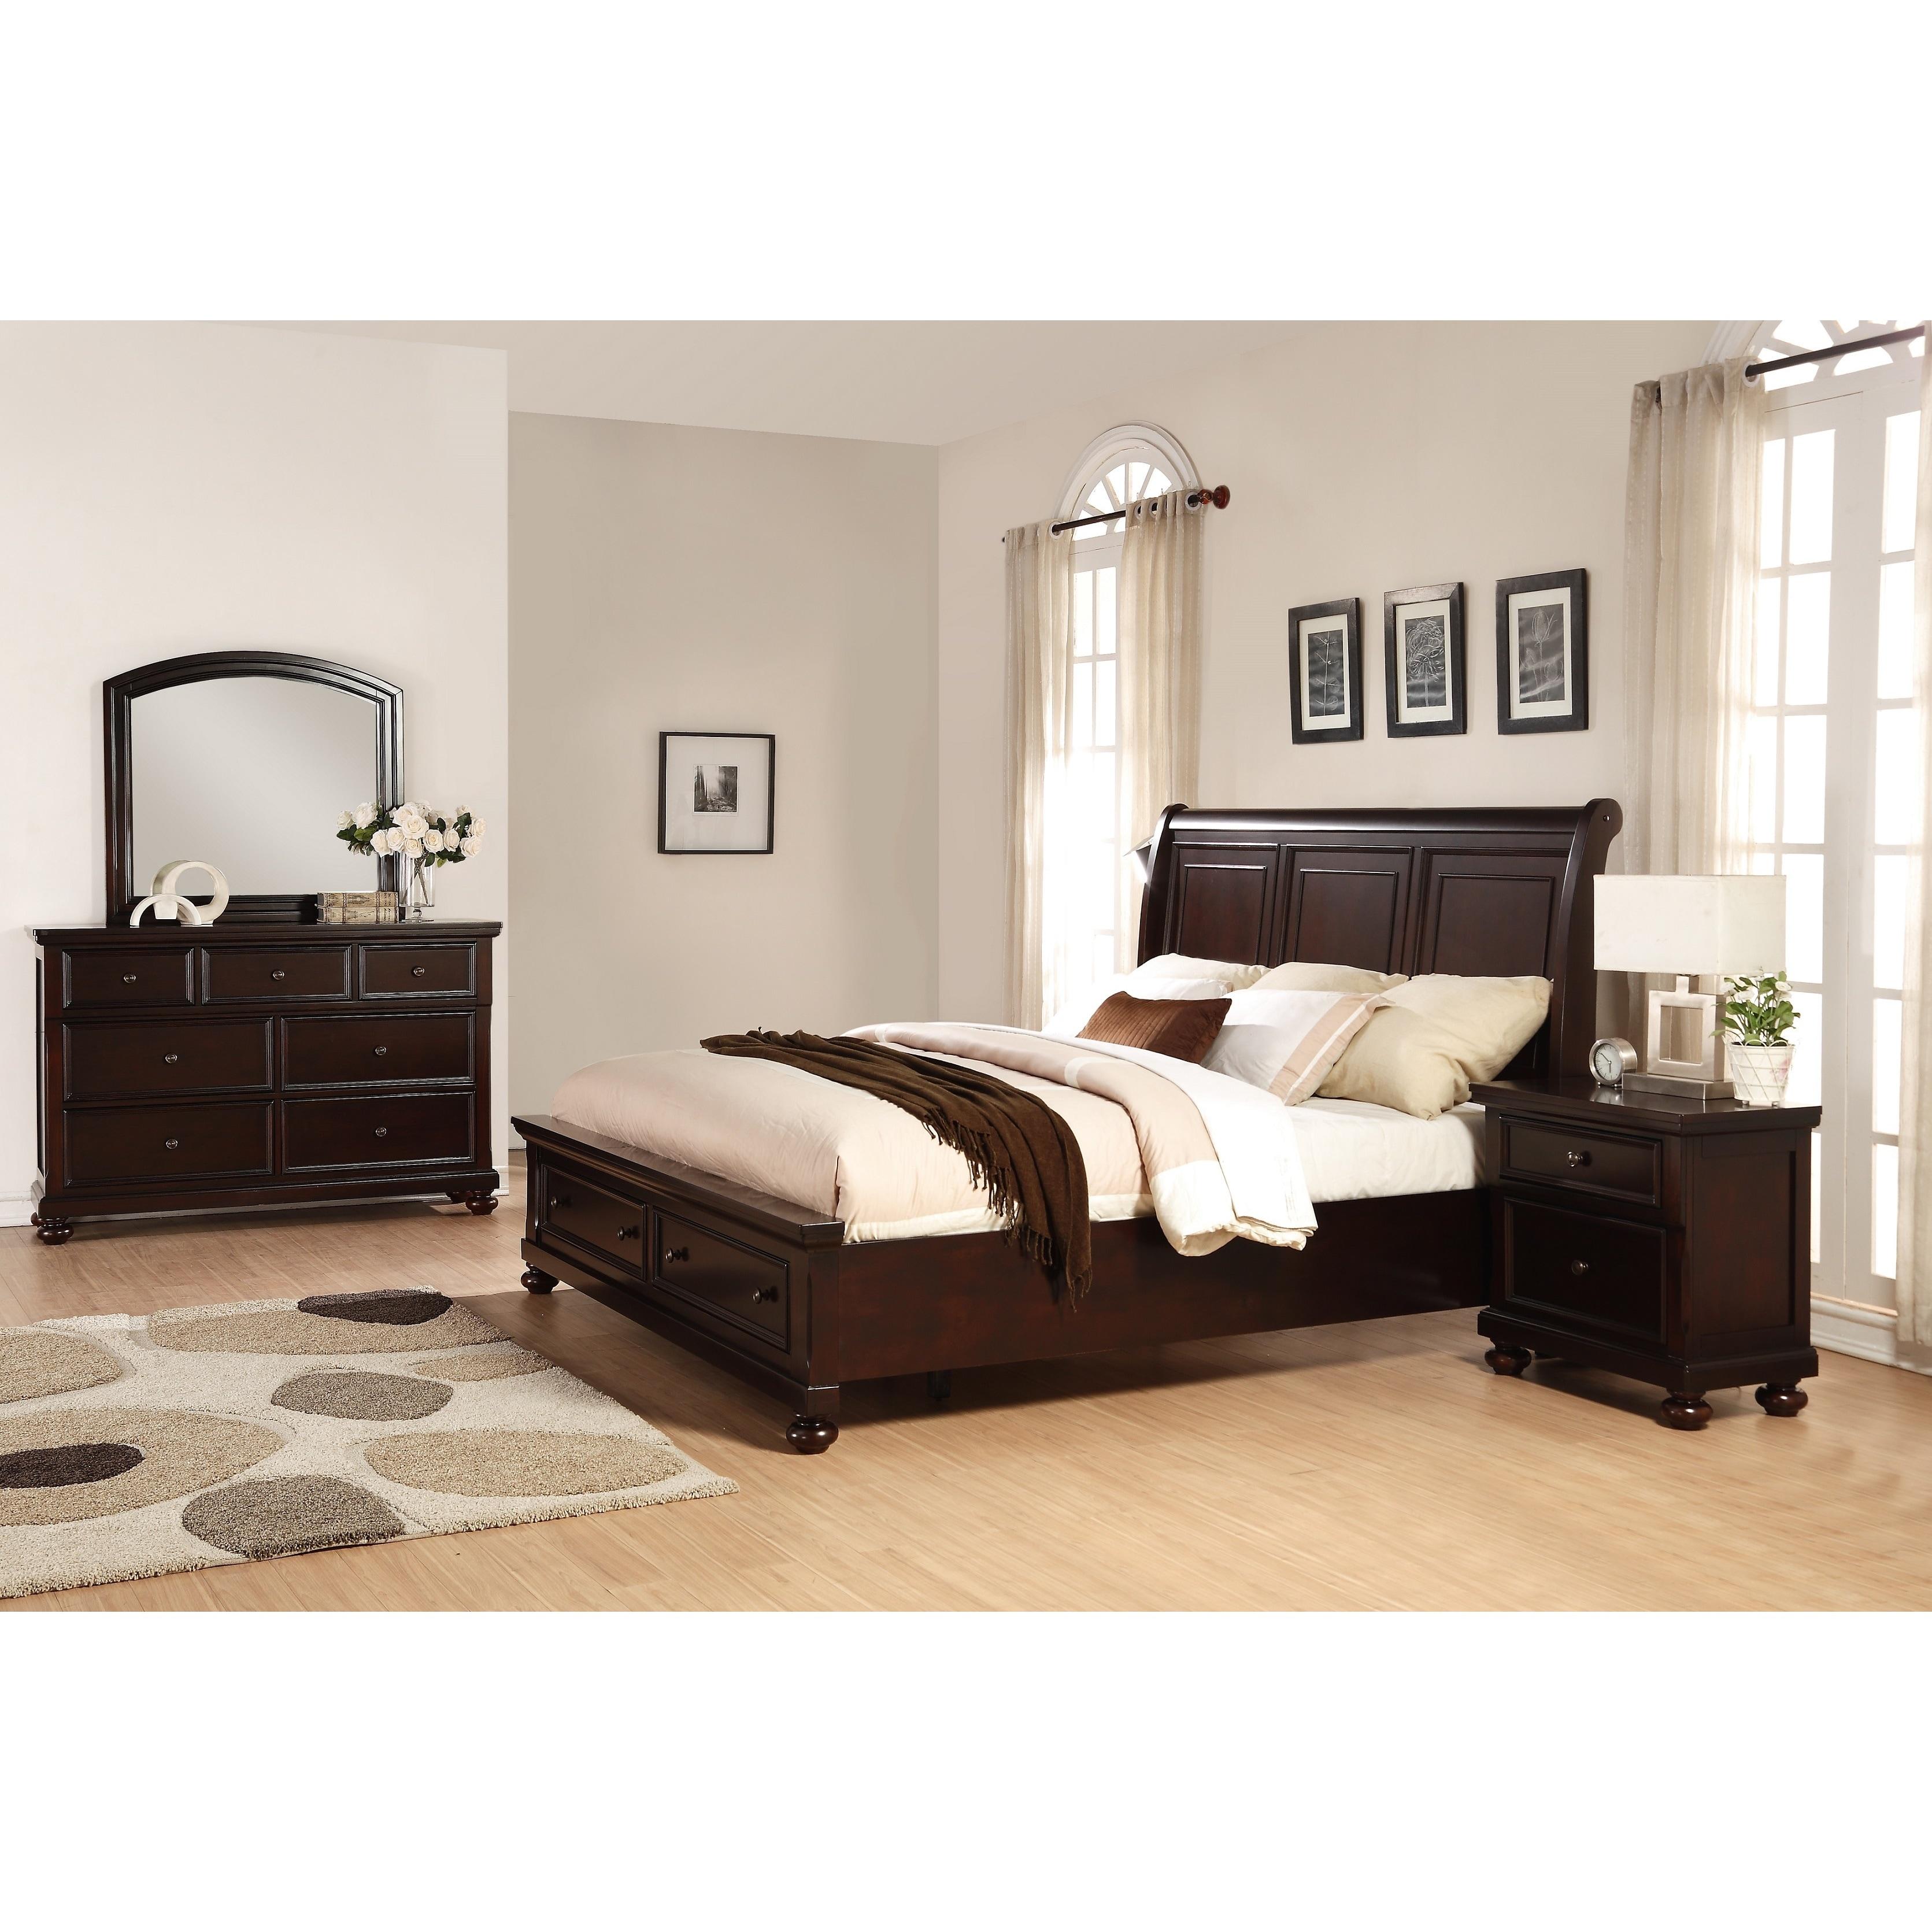 Charmant Brishland Rustic Cherry Storage 4 Piece King Size Bedroom Set